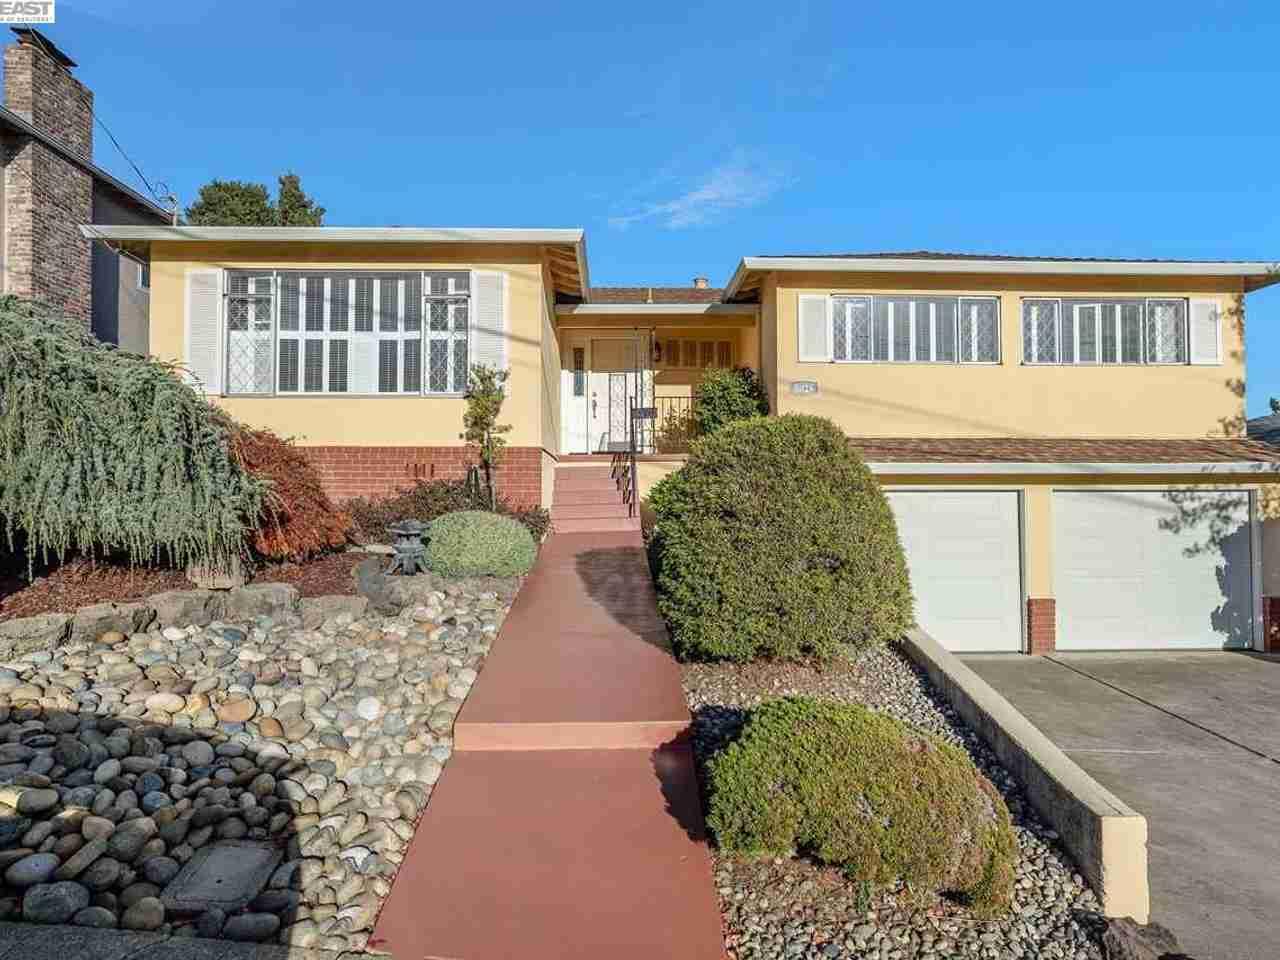 5026 Tyler Ln Castro Valley, CA, 94546